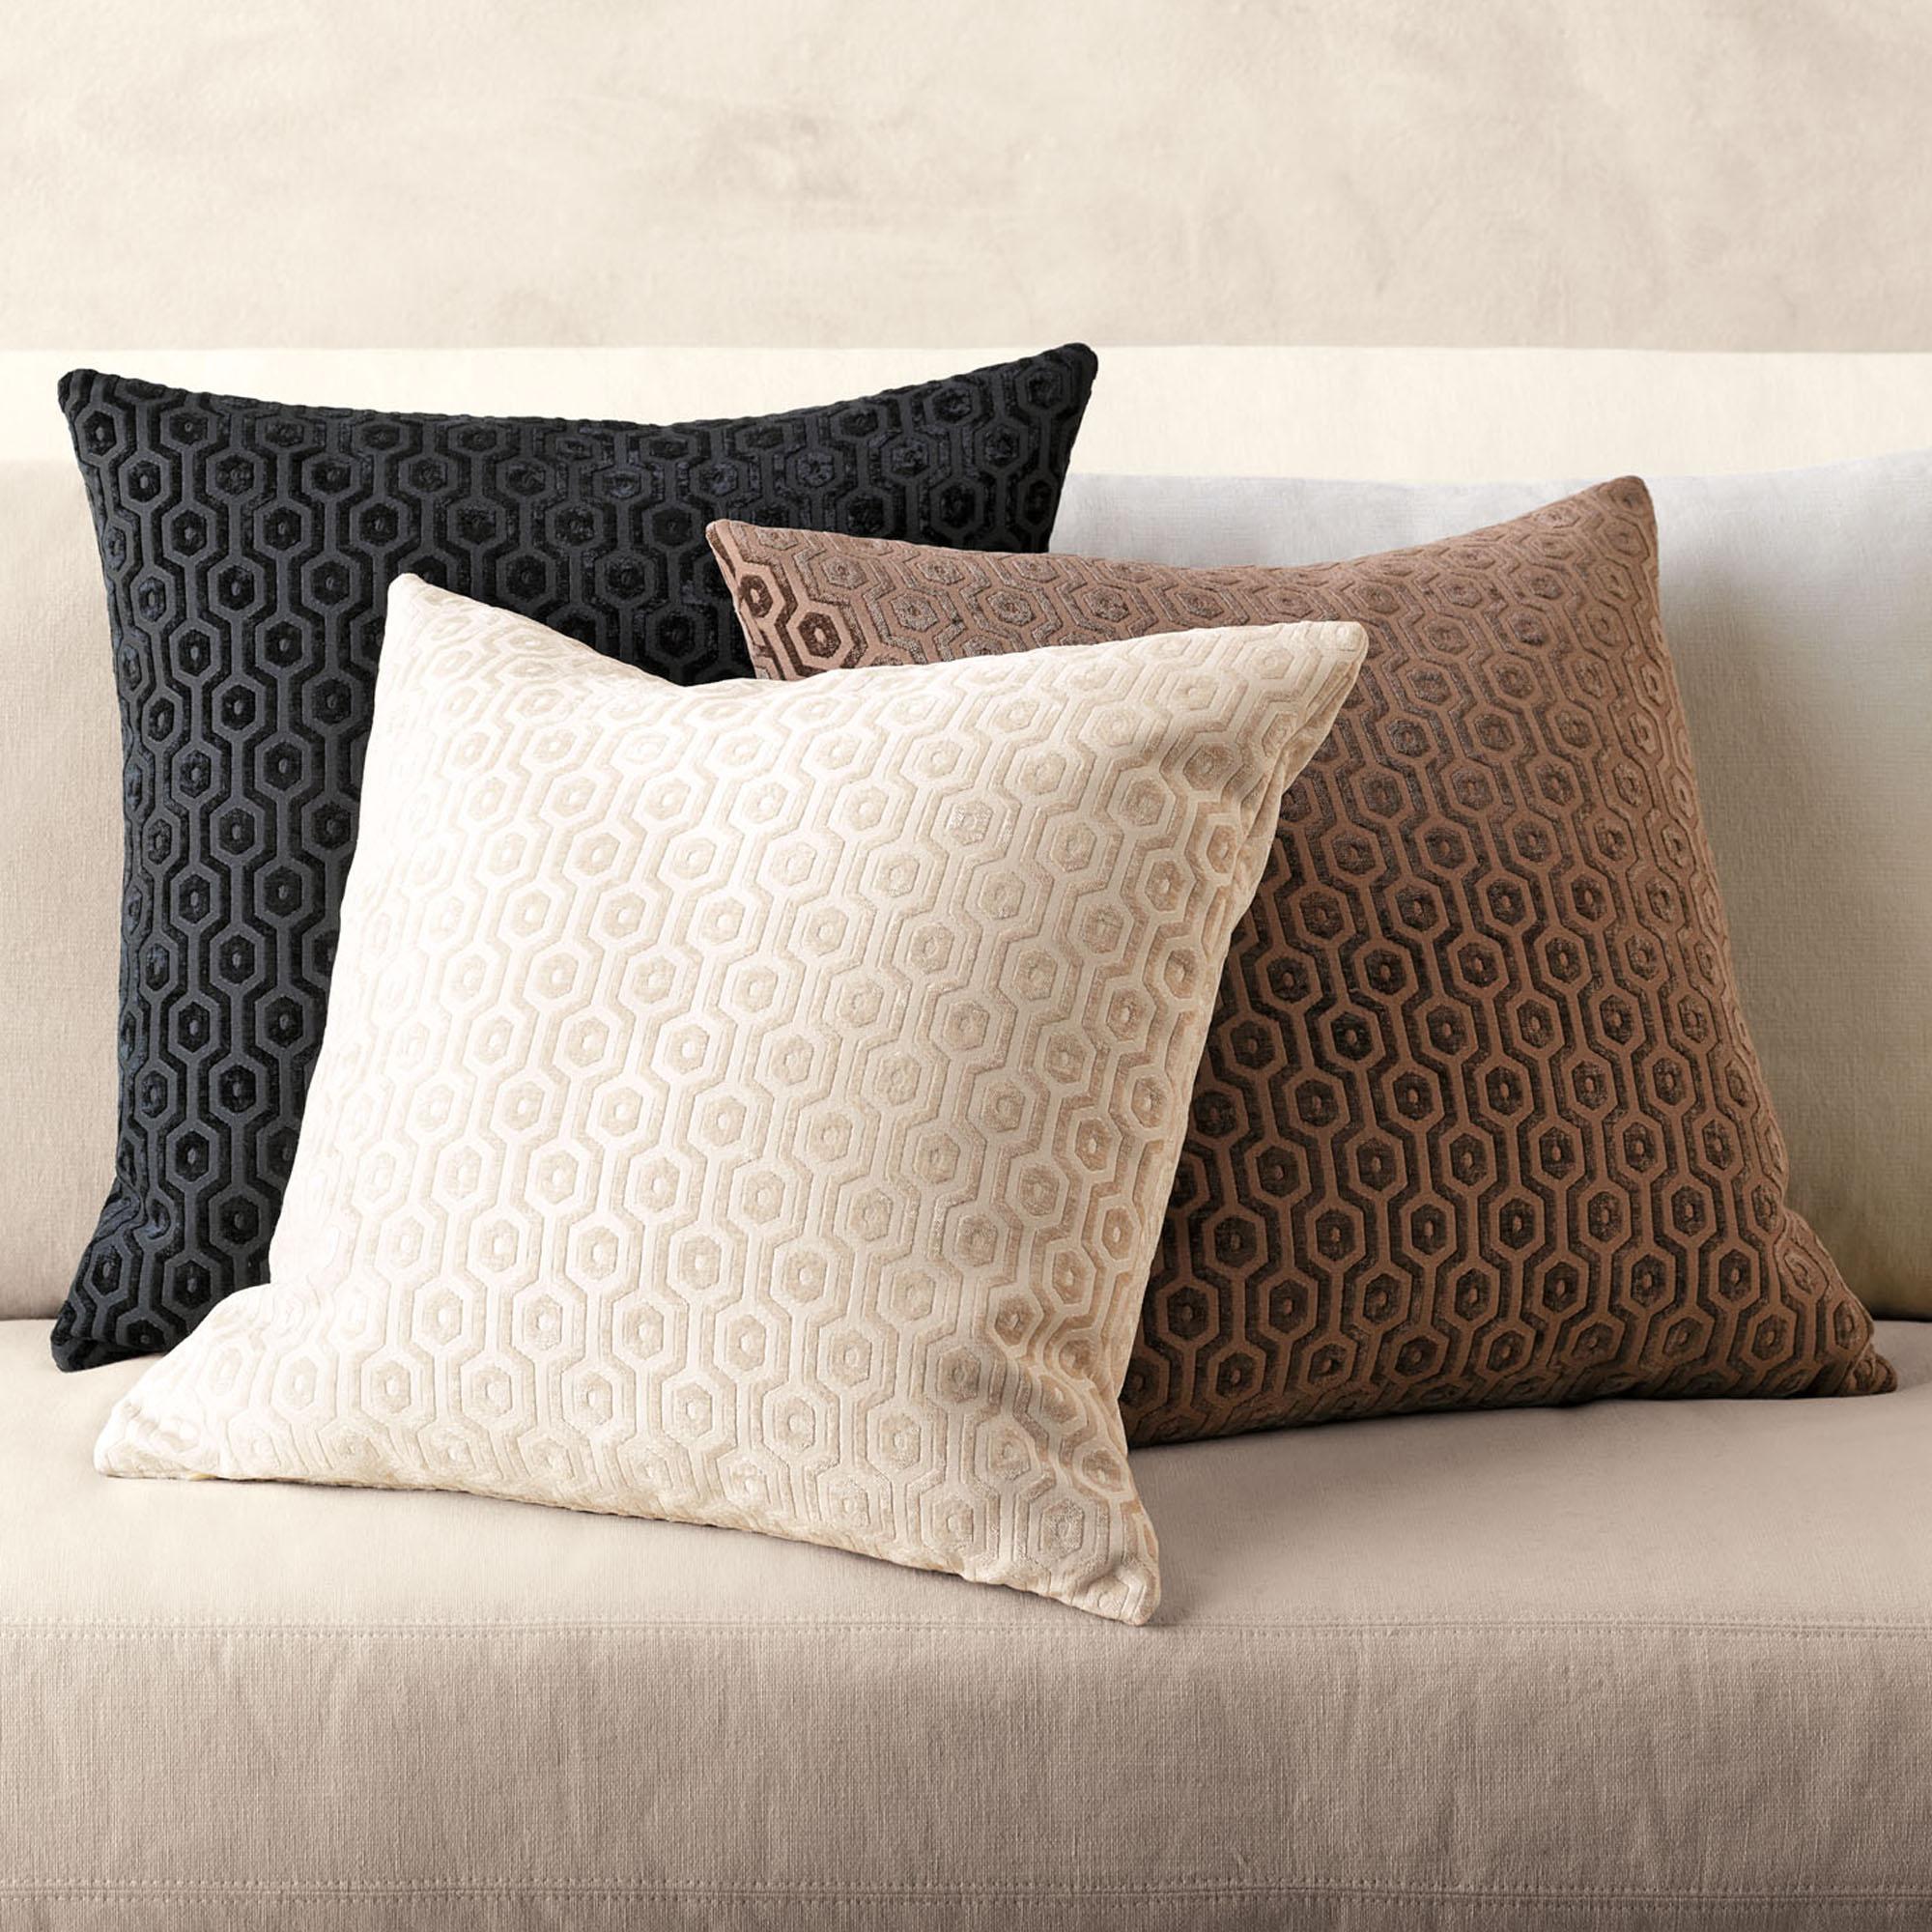 Throw Pillows Home : Geo Pillows Gump s